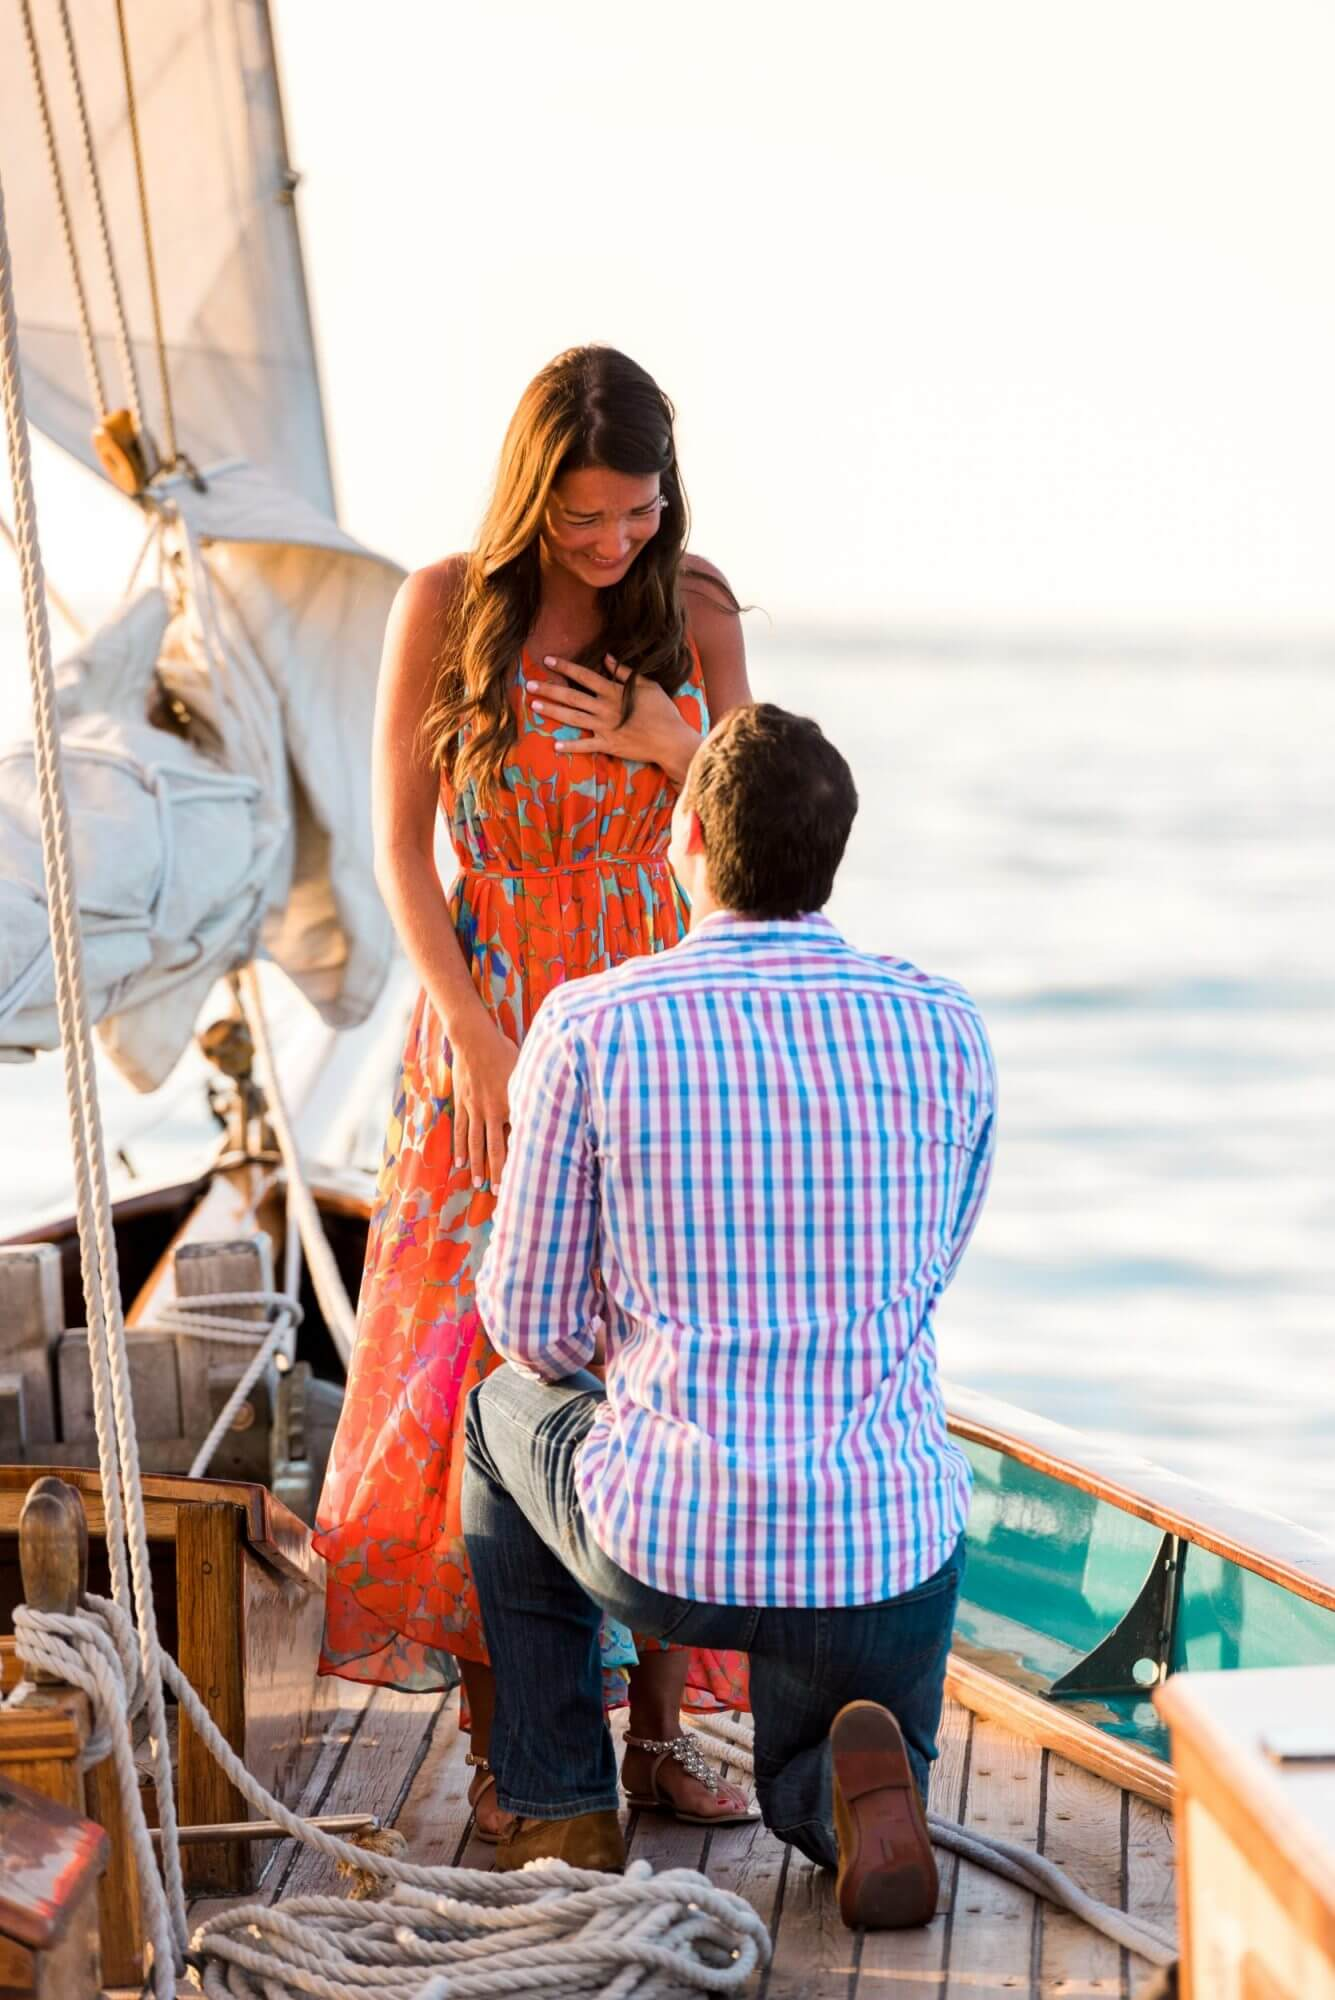 Elizabeth Alex Key West Engagement 40 - Elizabeth & Alex - Schooner Hindu Proposal - Key West Engagement Photography